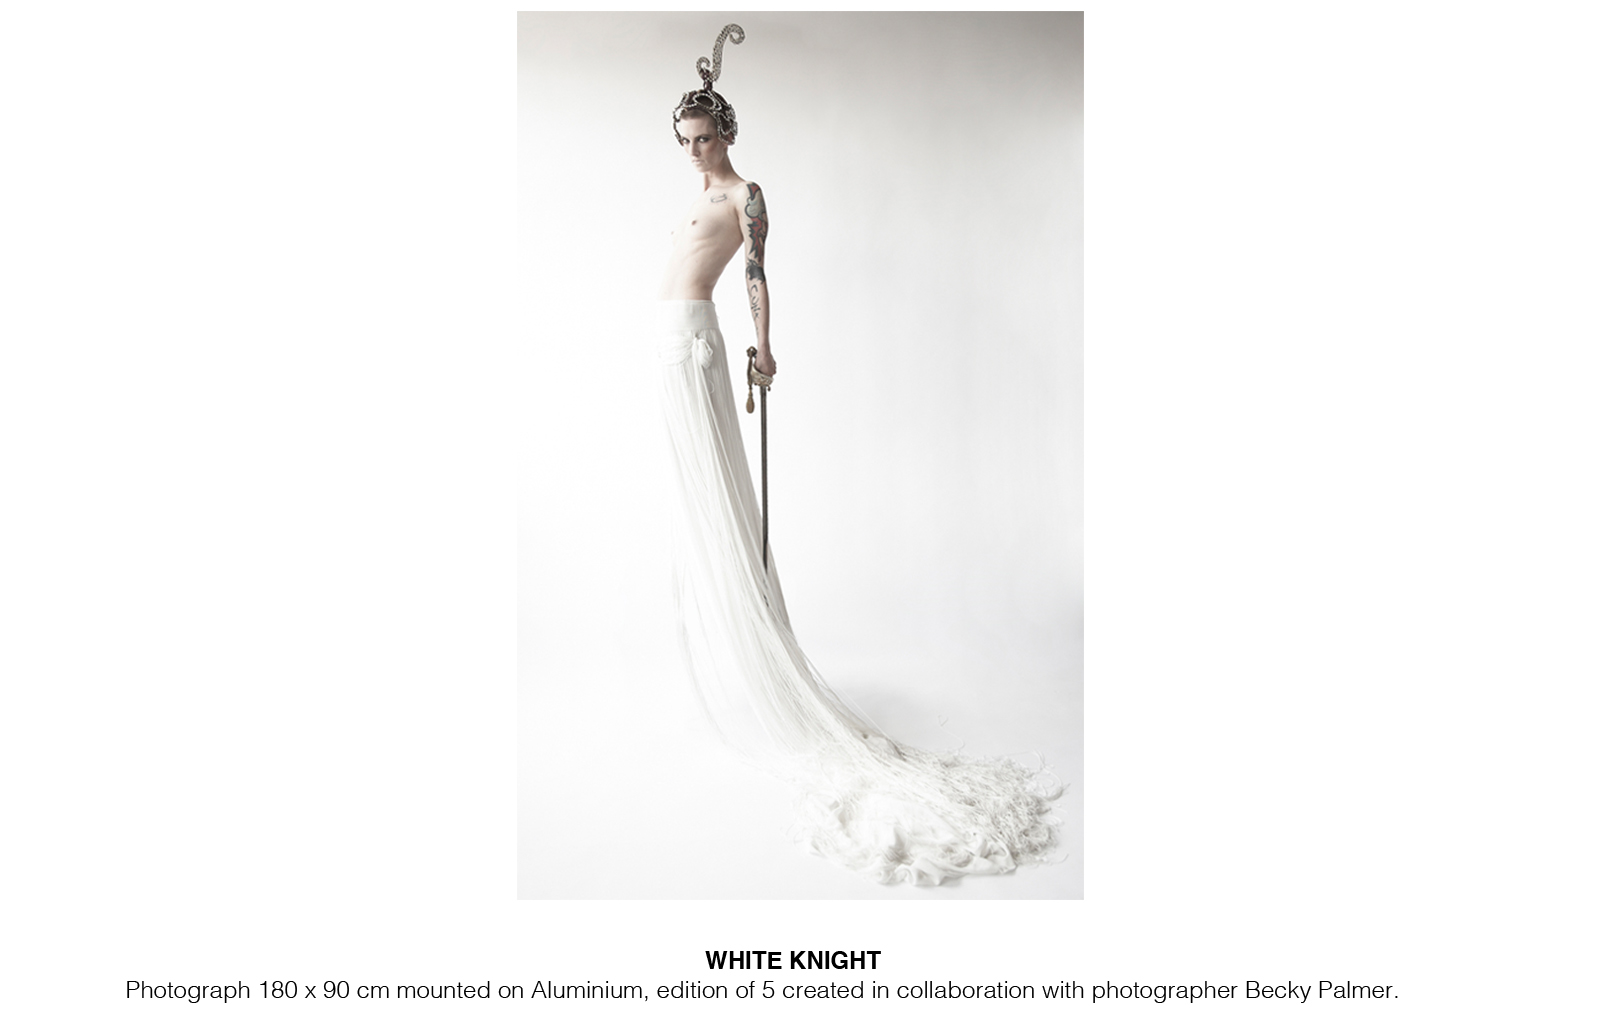 whiteknightv3